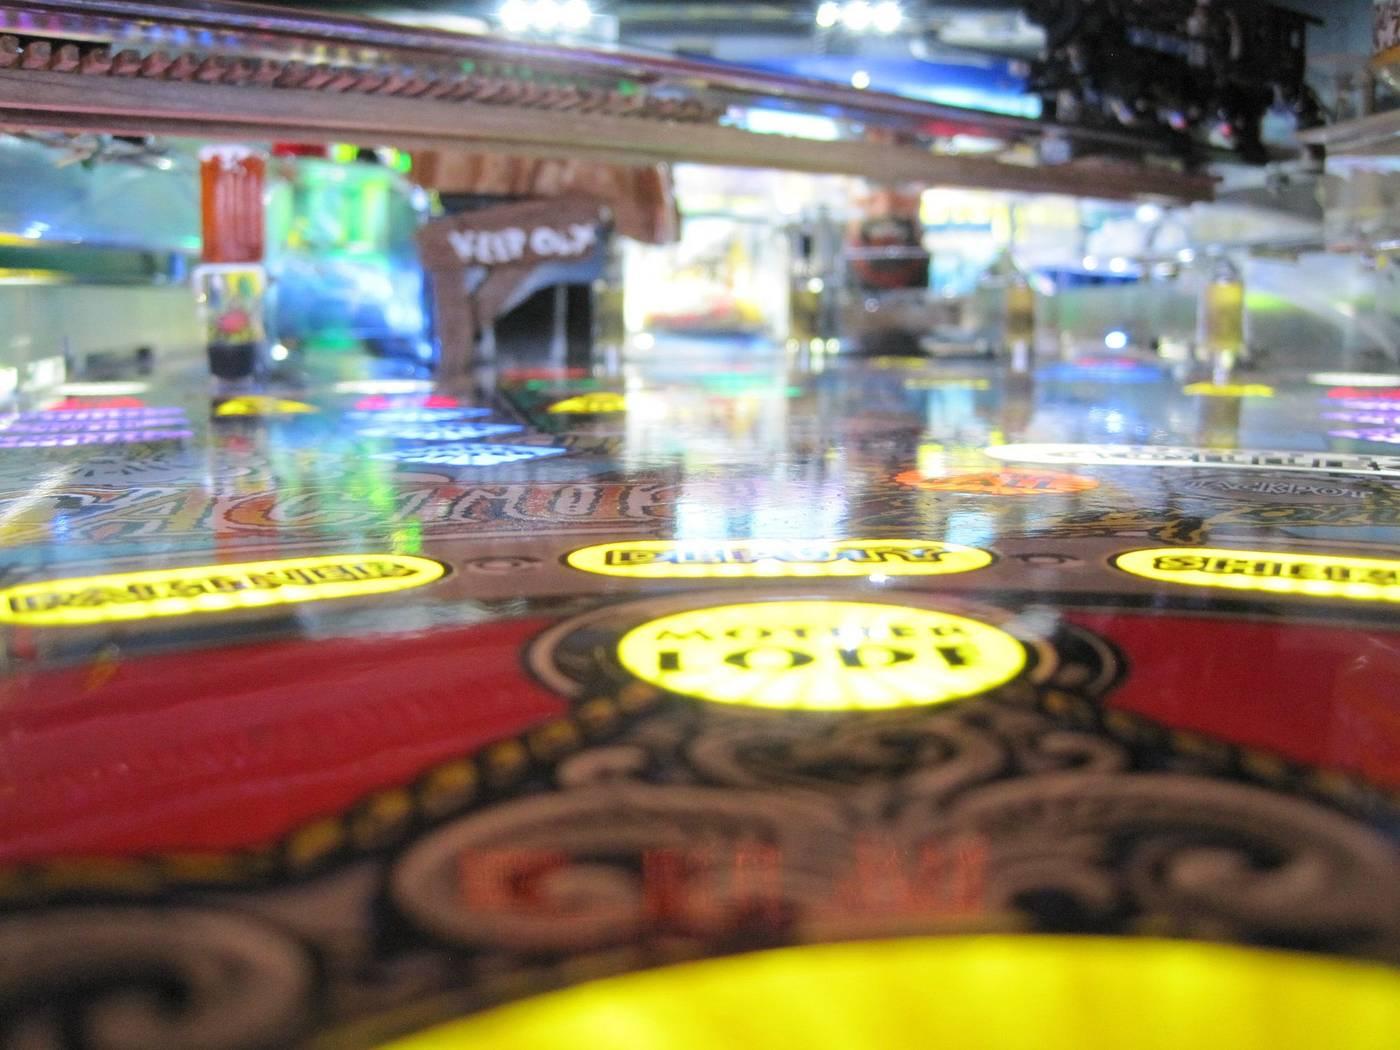 cactus pinball machine for sale